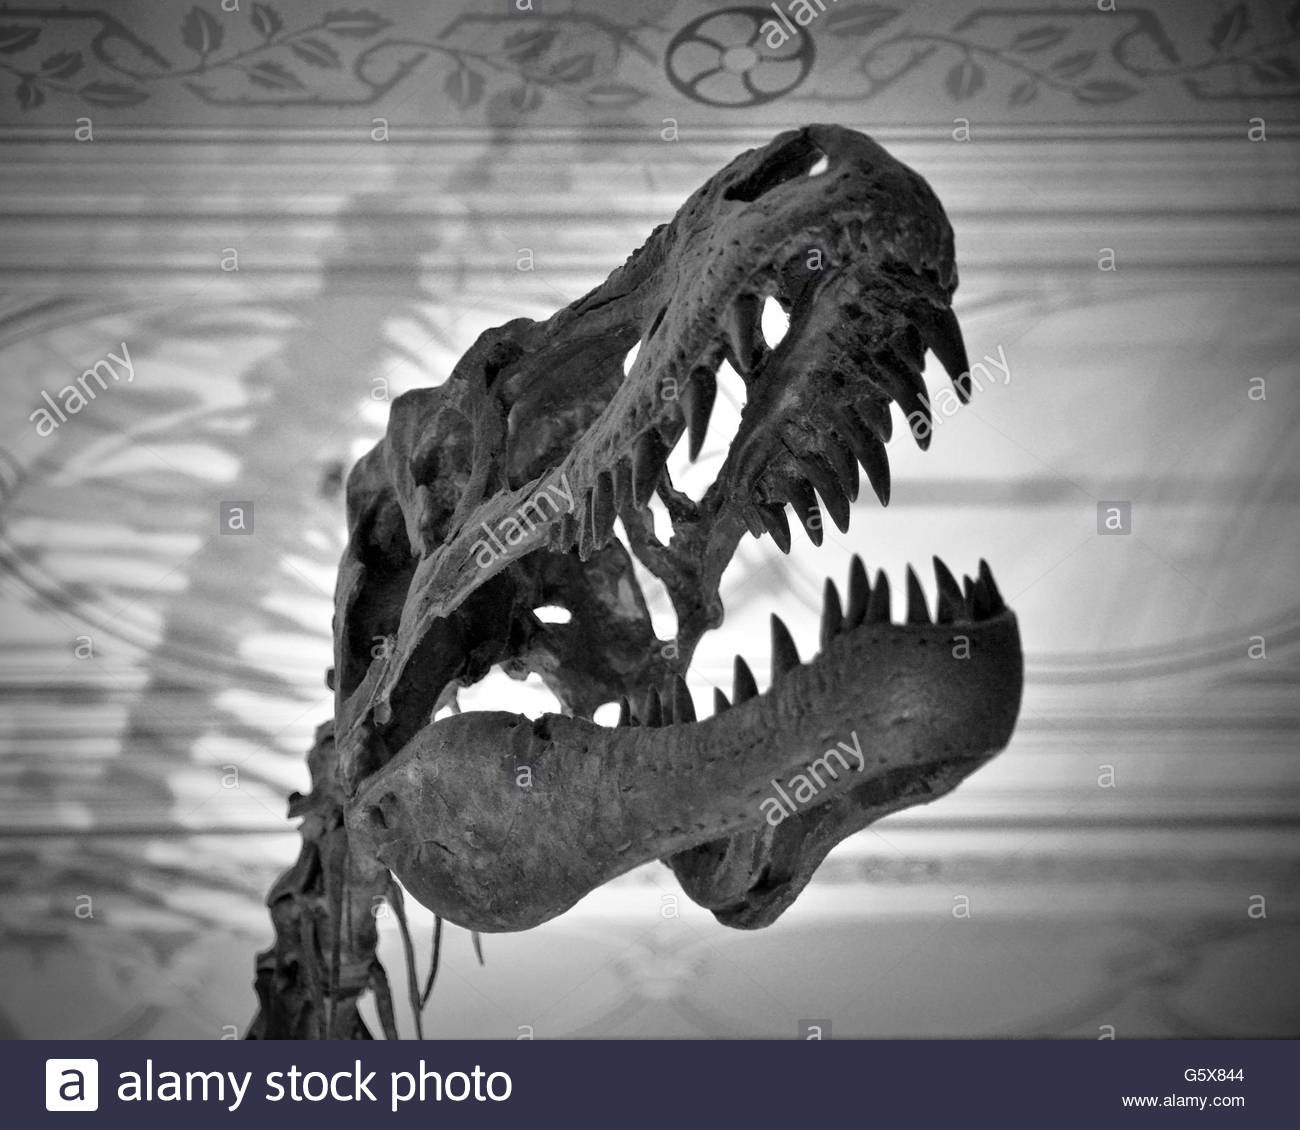 dinosaur skeleton bones head stockfotos dinosaur skeleton bones head bilder alamy. Black Bedroom Furniture Sets. Home Design Ideas